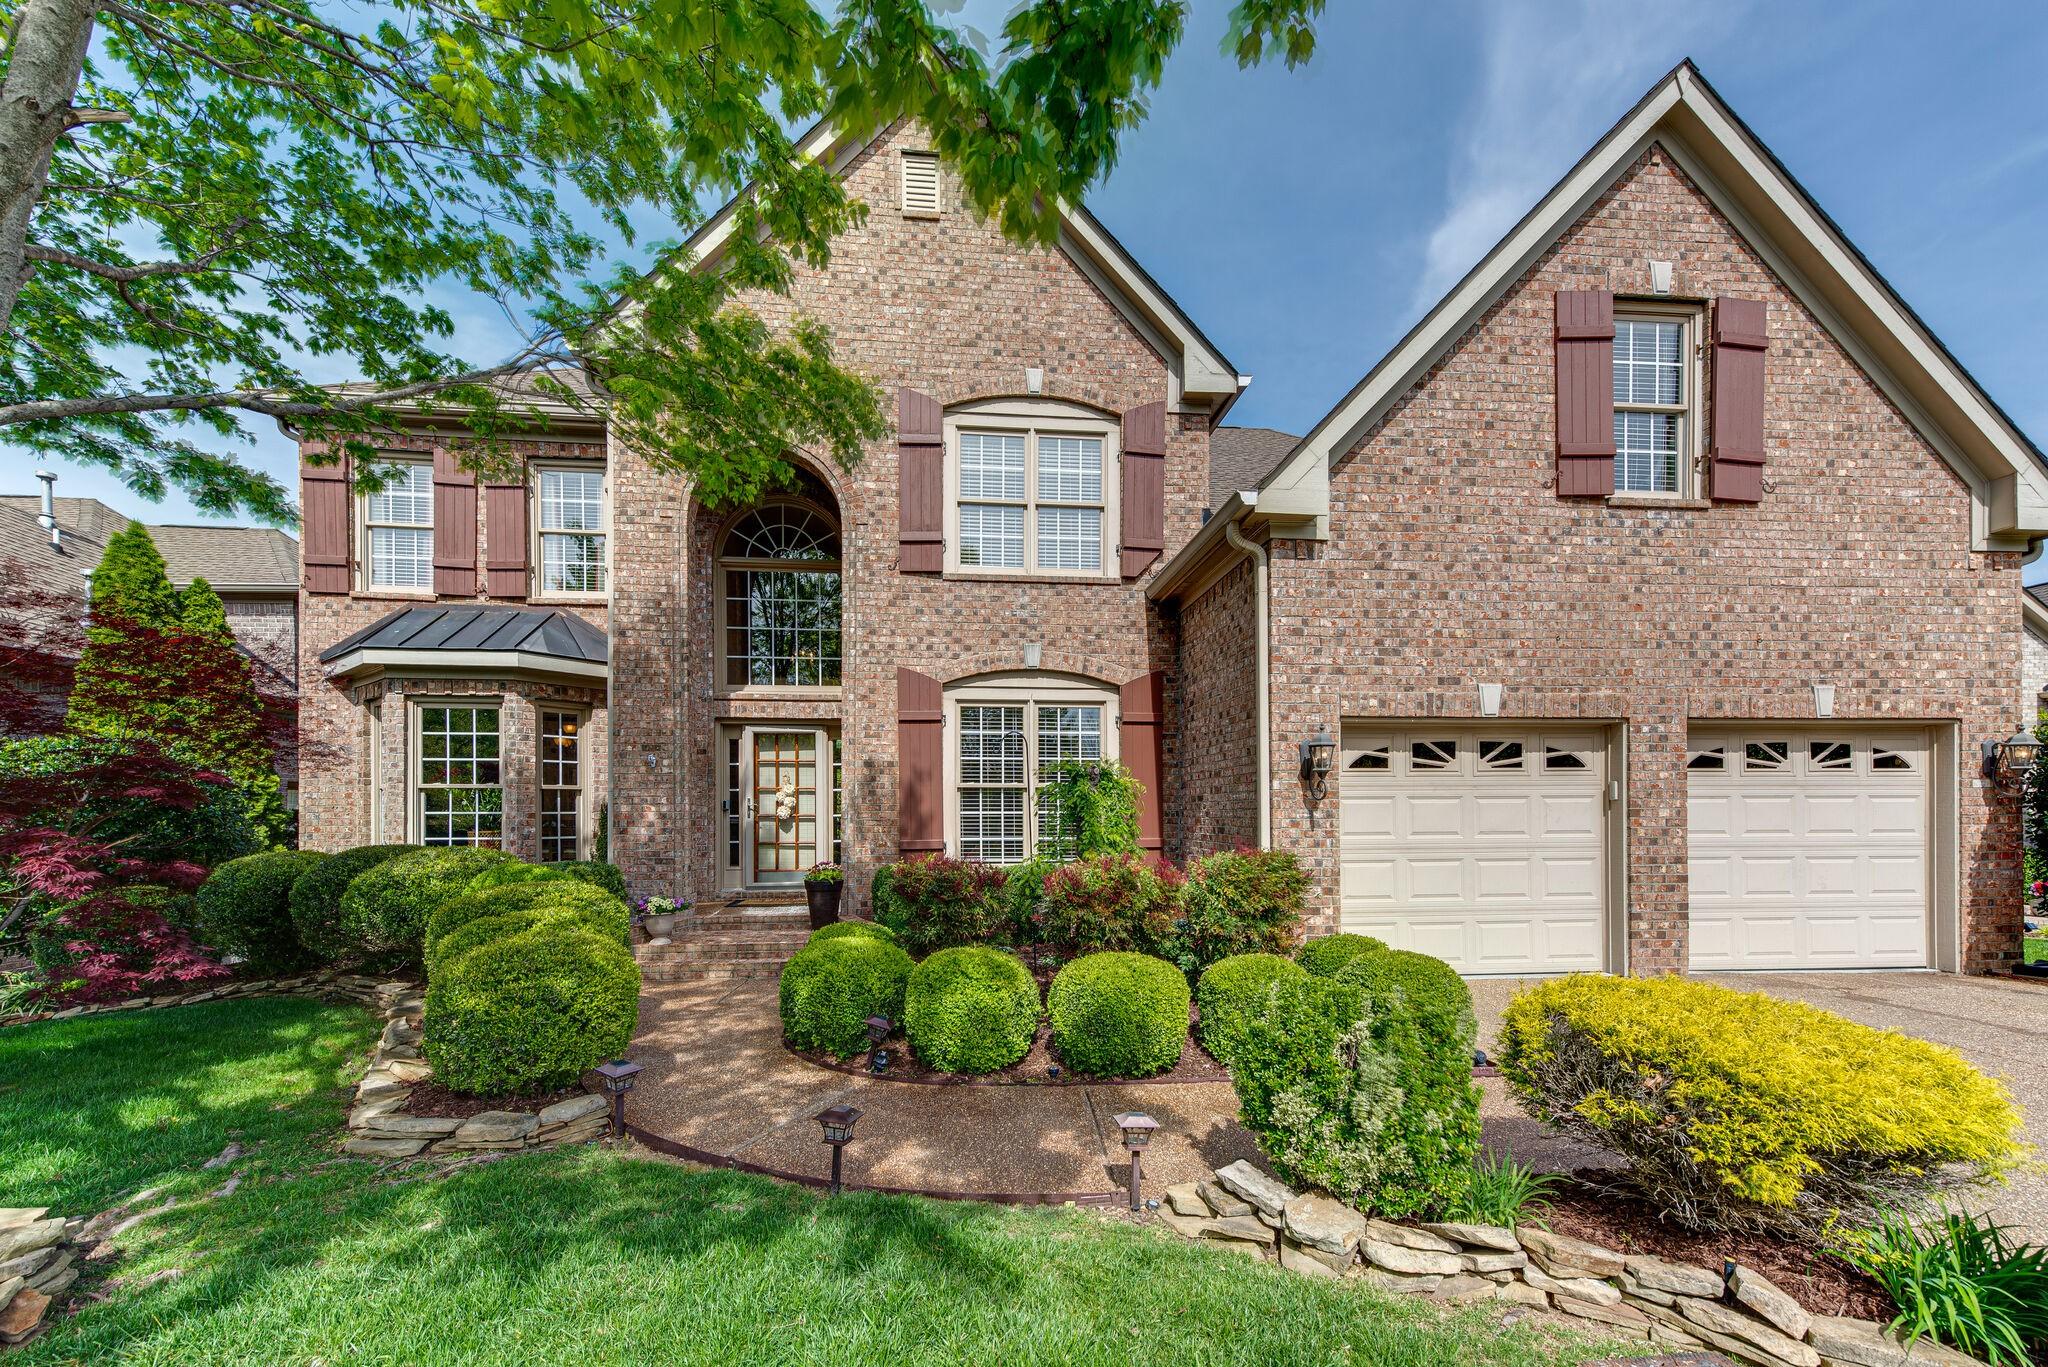 413 Caledonian Ct Property Photo - Nashville, TN real estate listing